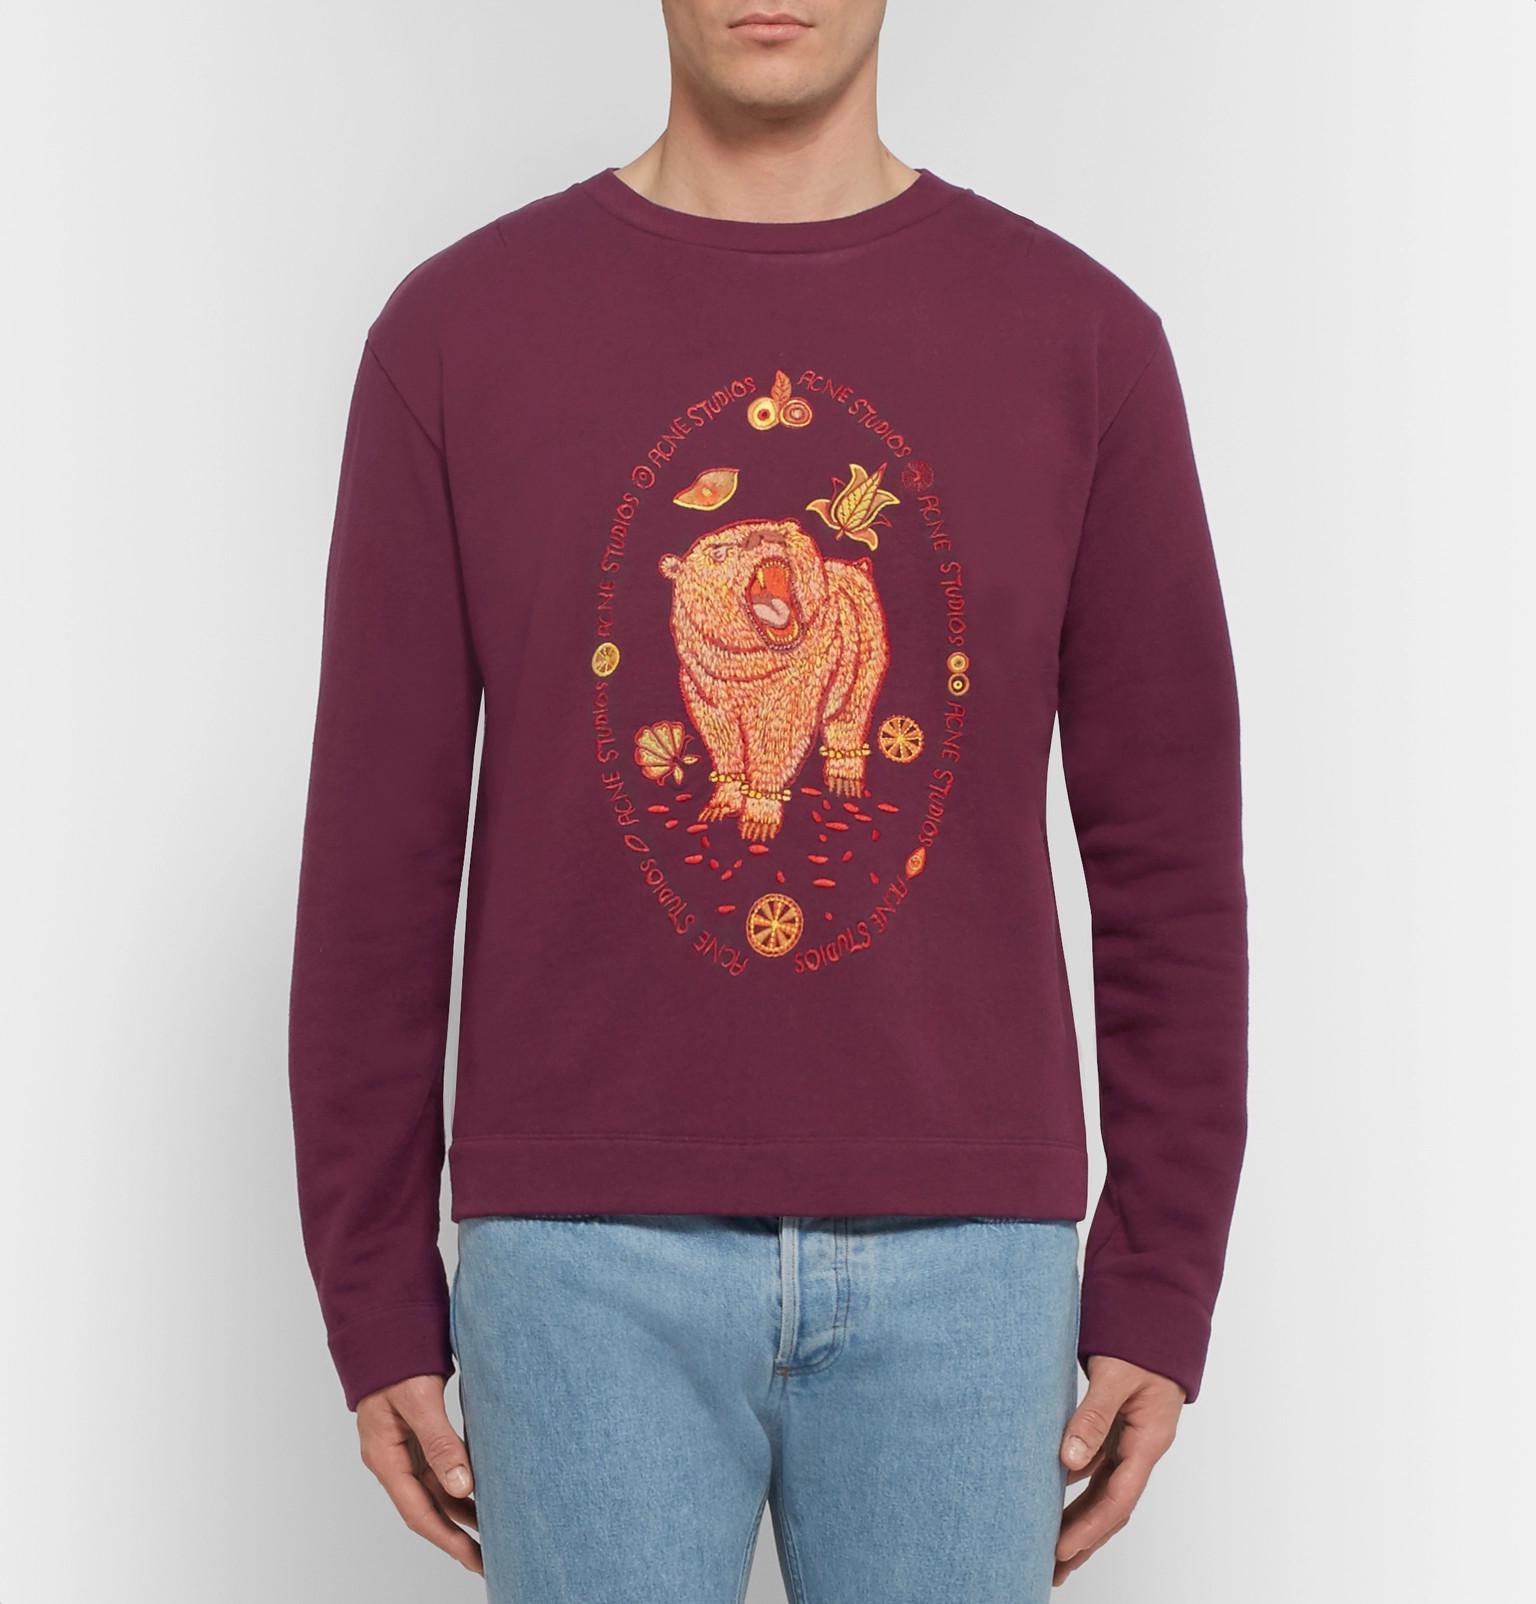 Acne bordado Bear Loopback de E jersey Studios camiseta algodón Oslavi SZqw8Fgvv